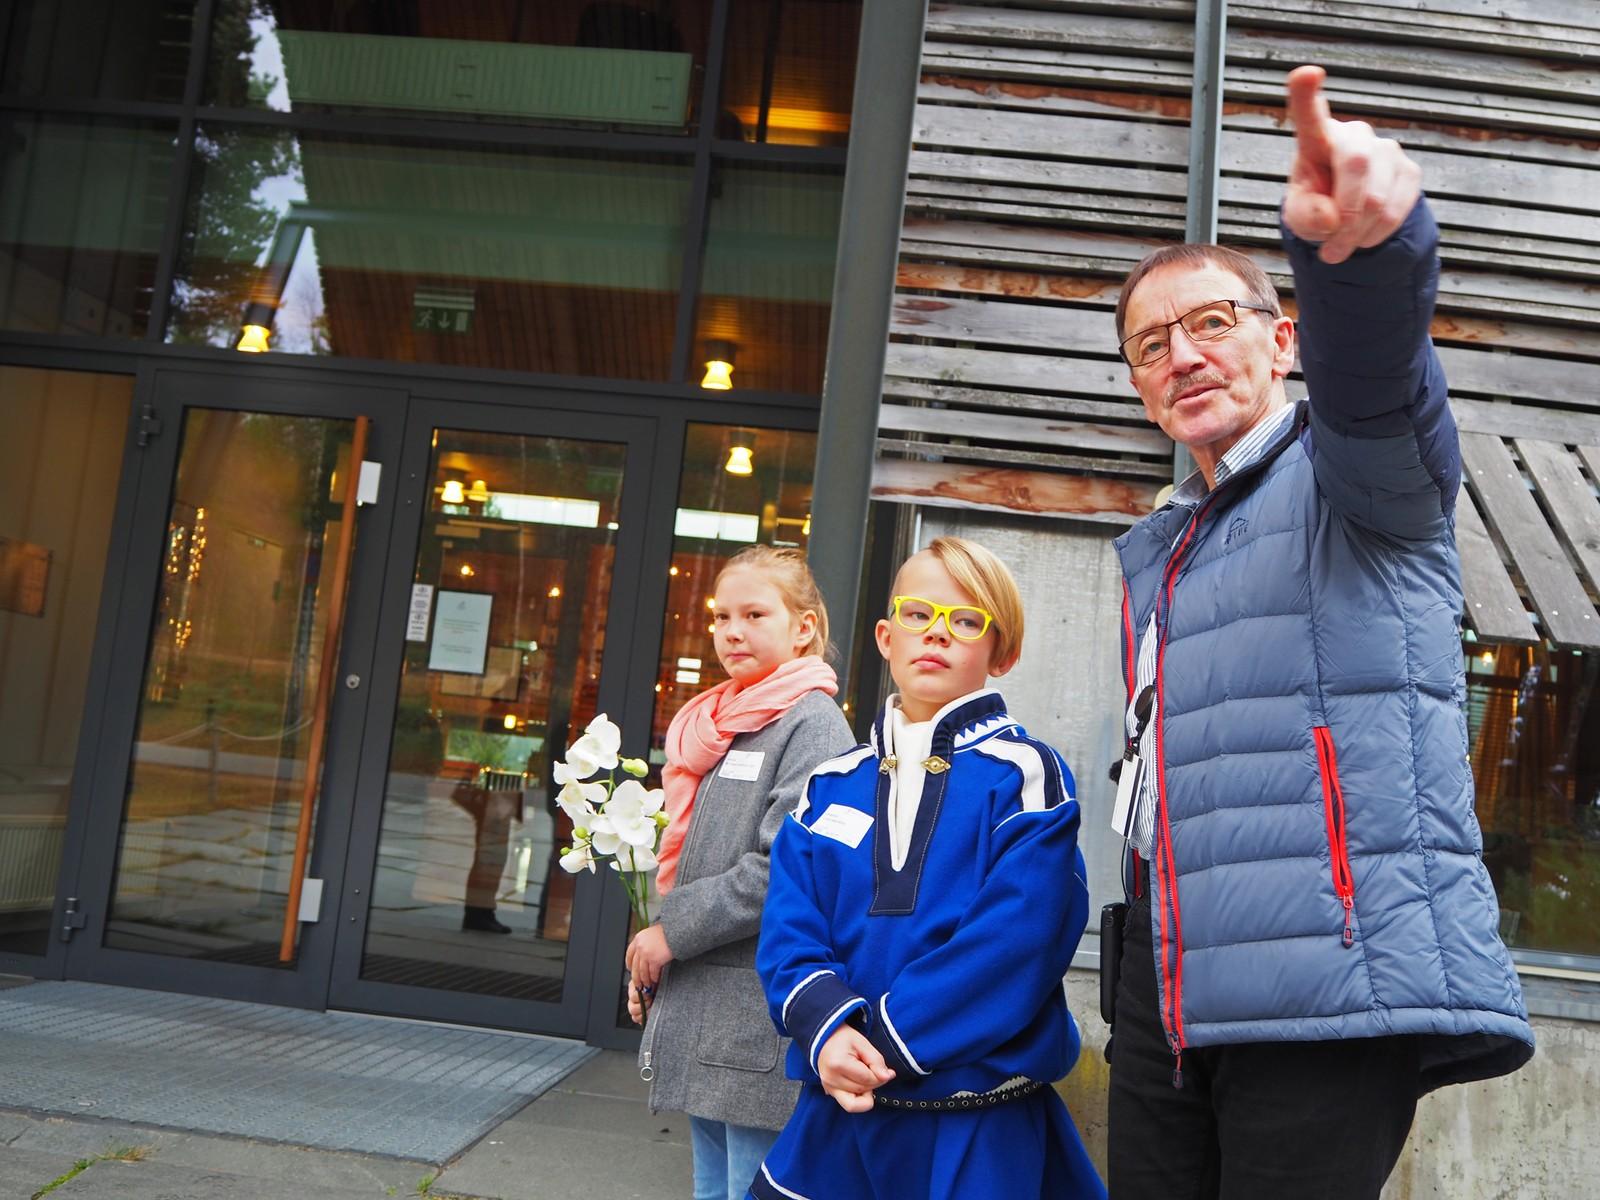 VISER: Sametingets Kåre Balto peker til der de kongelige ankommer med bilen sin.